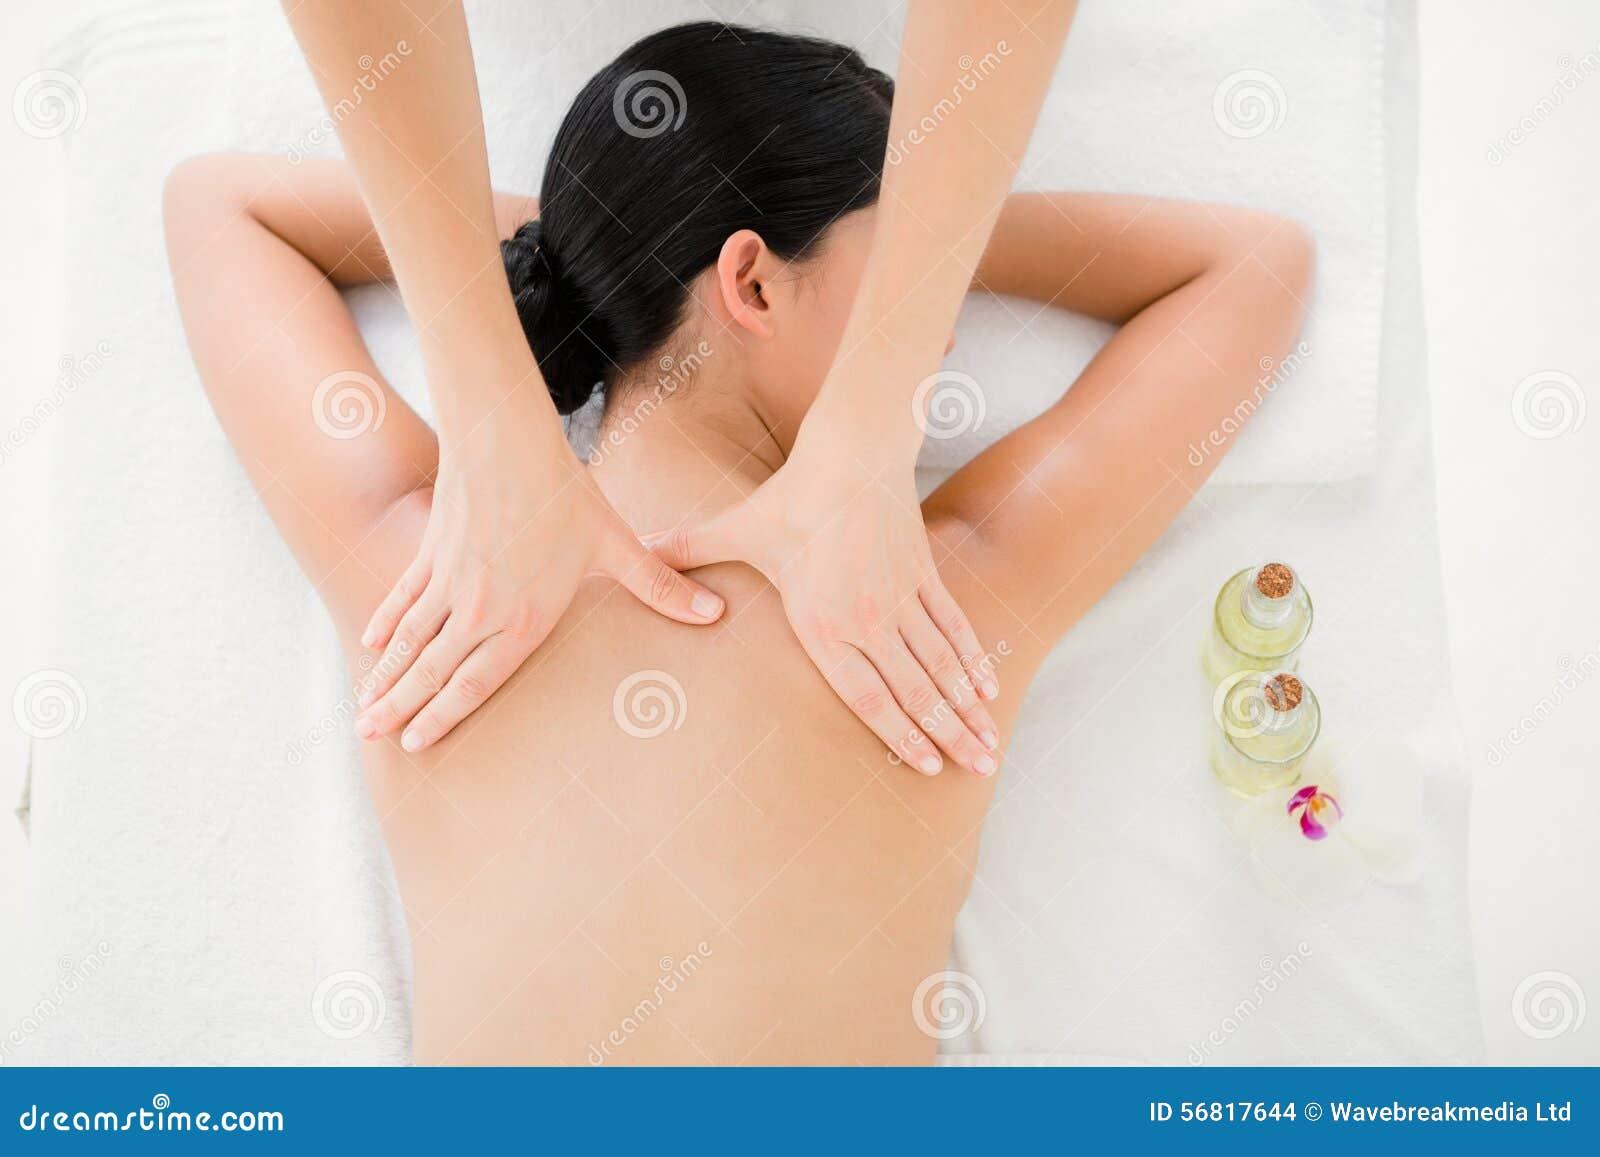 sitio mujer masaje de próstata